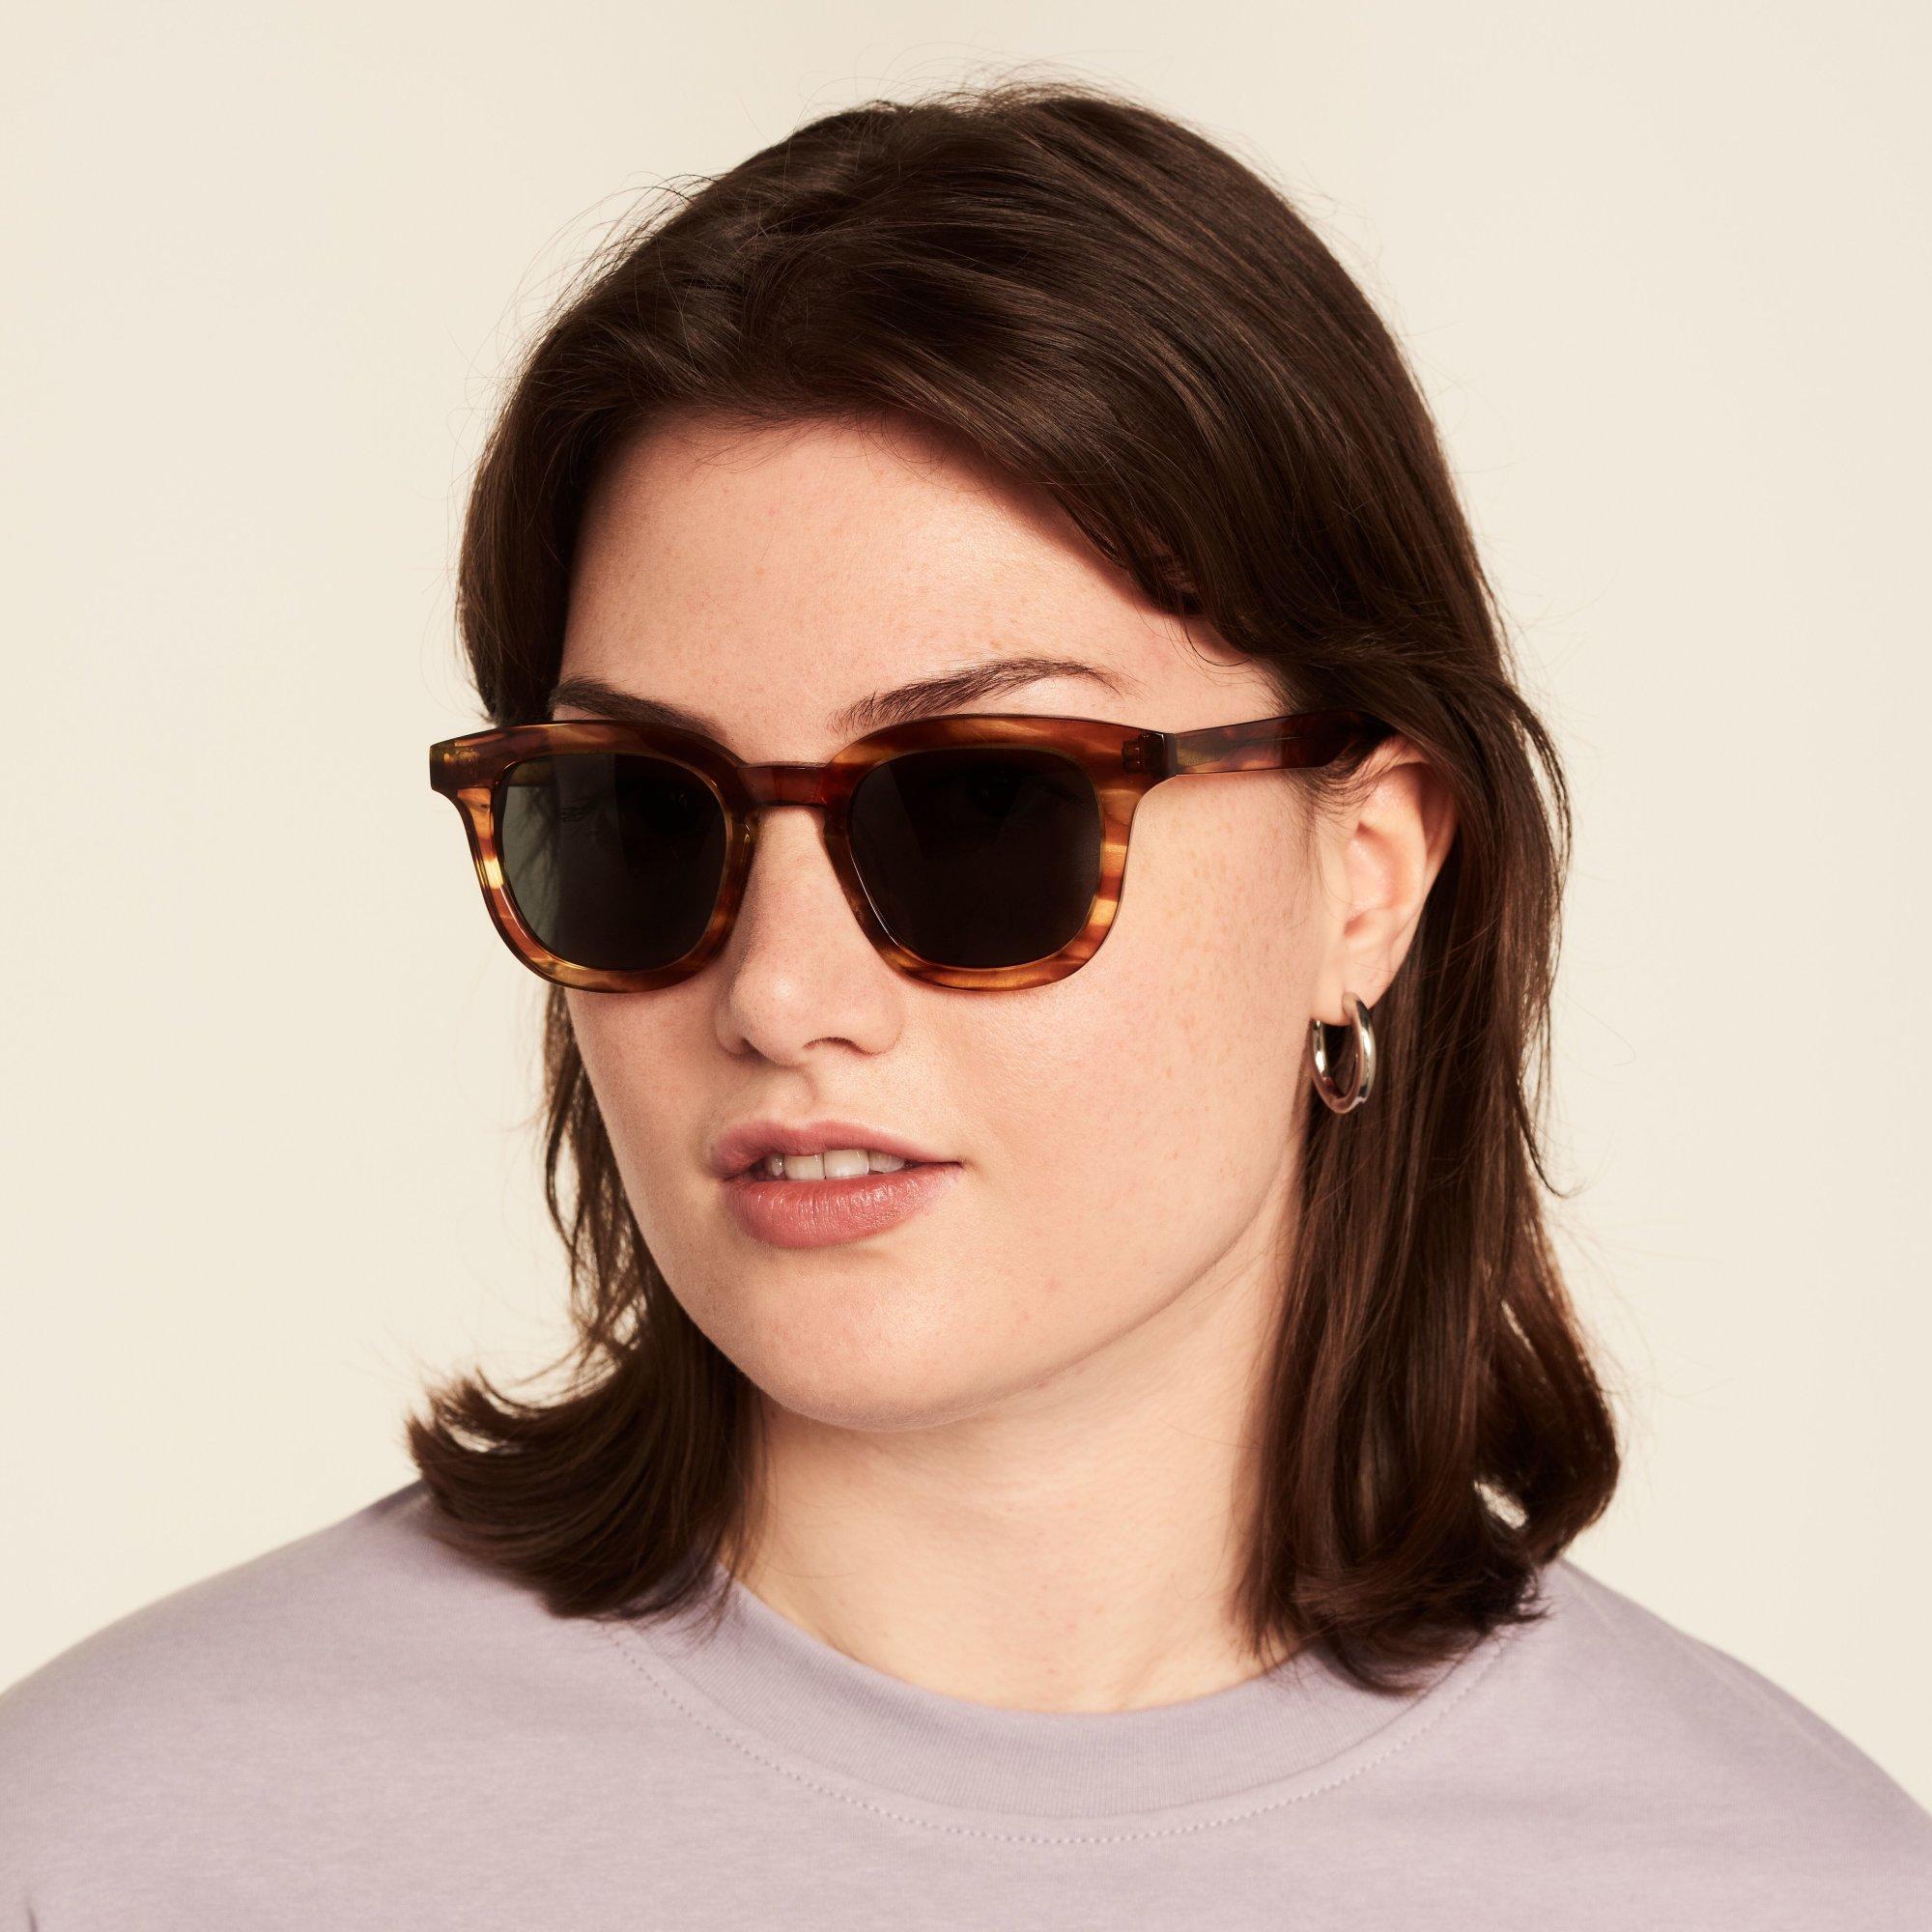 Ace & Tate Sunglasses   square acetate in Brown, Orange